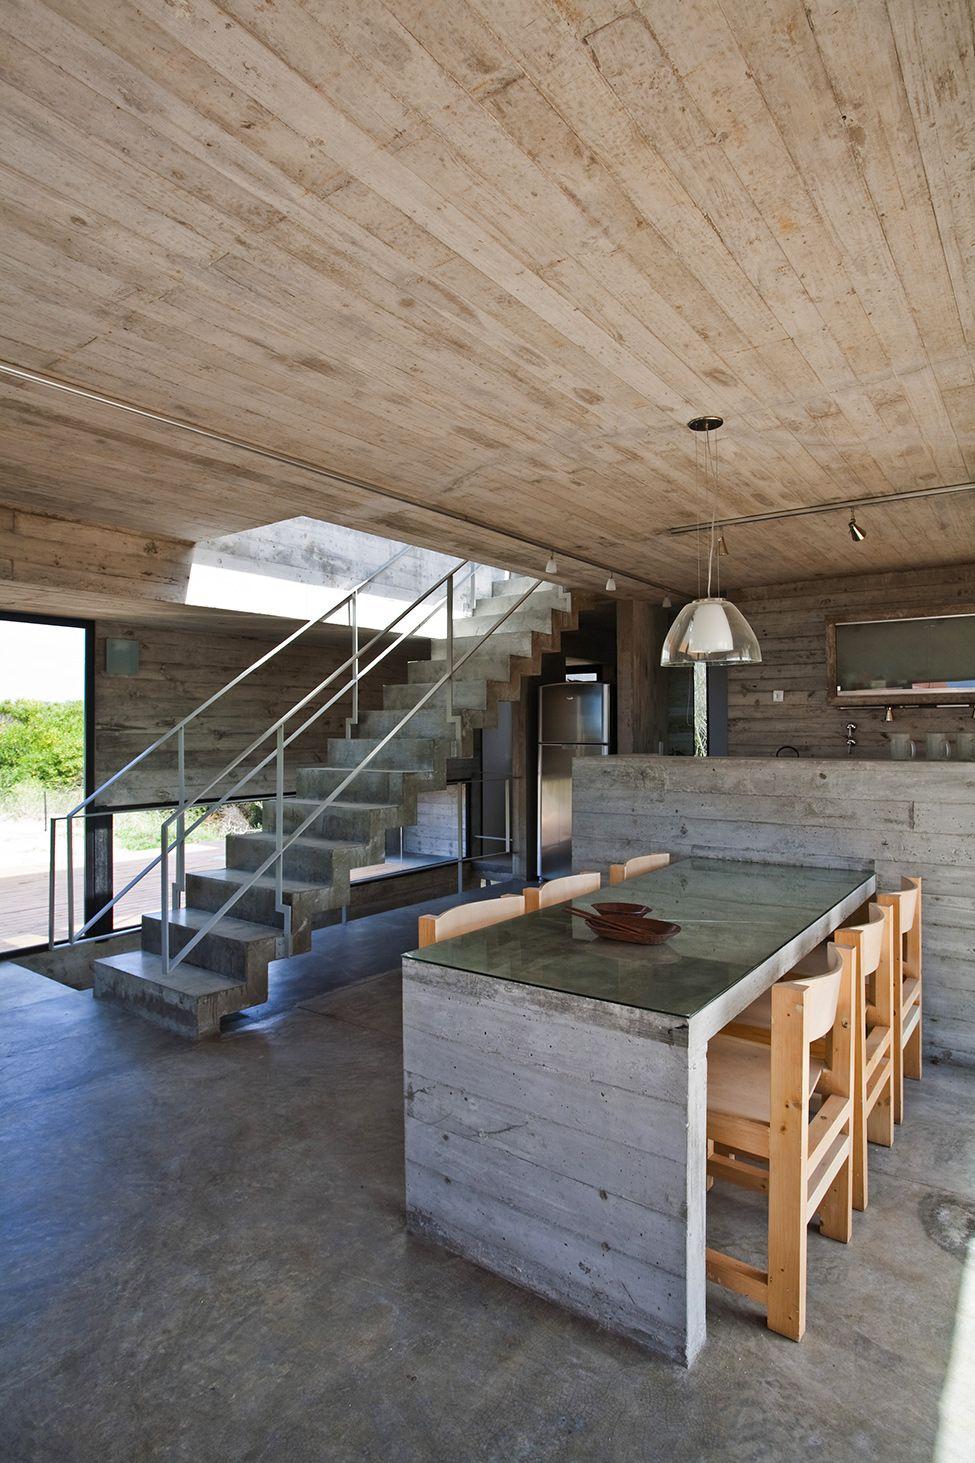 Moving Checklist Relocation Tips Get Help Moving Concrete House Concrete Wall Interior Design Concrete Walls Interior